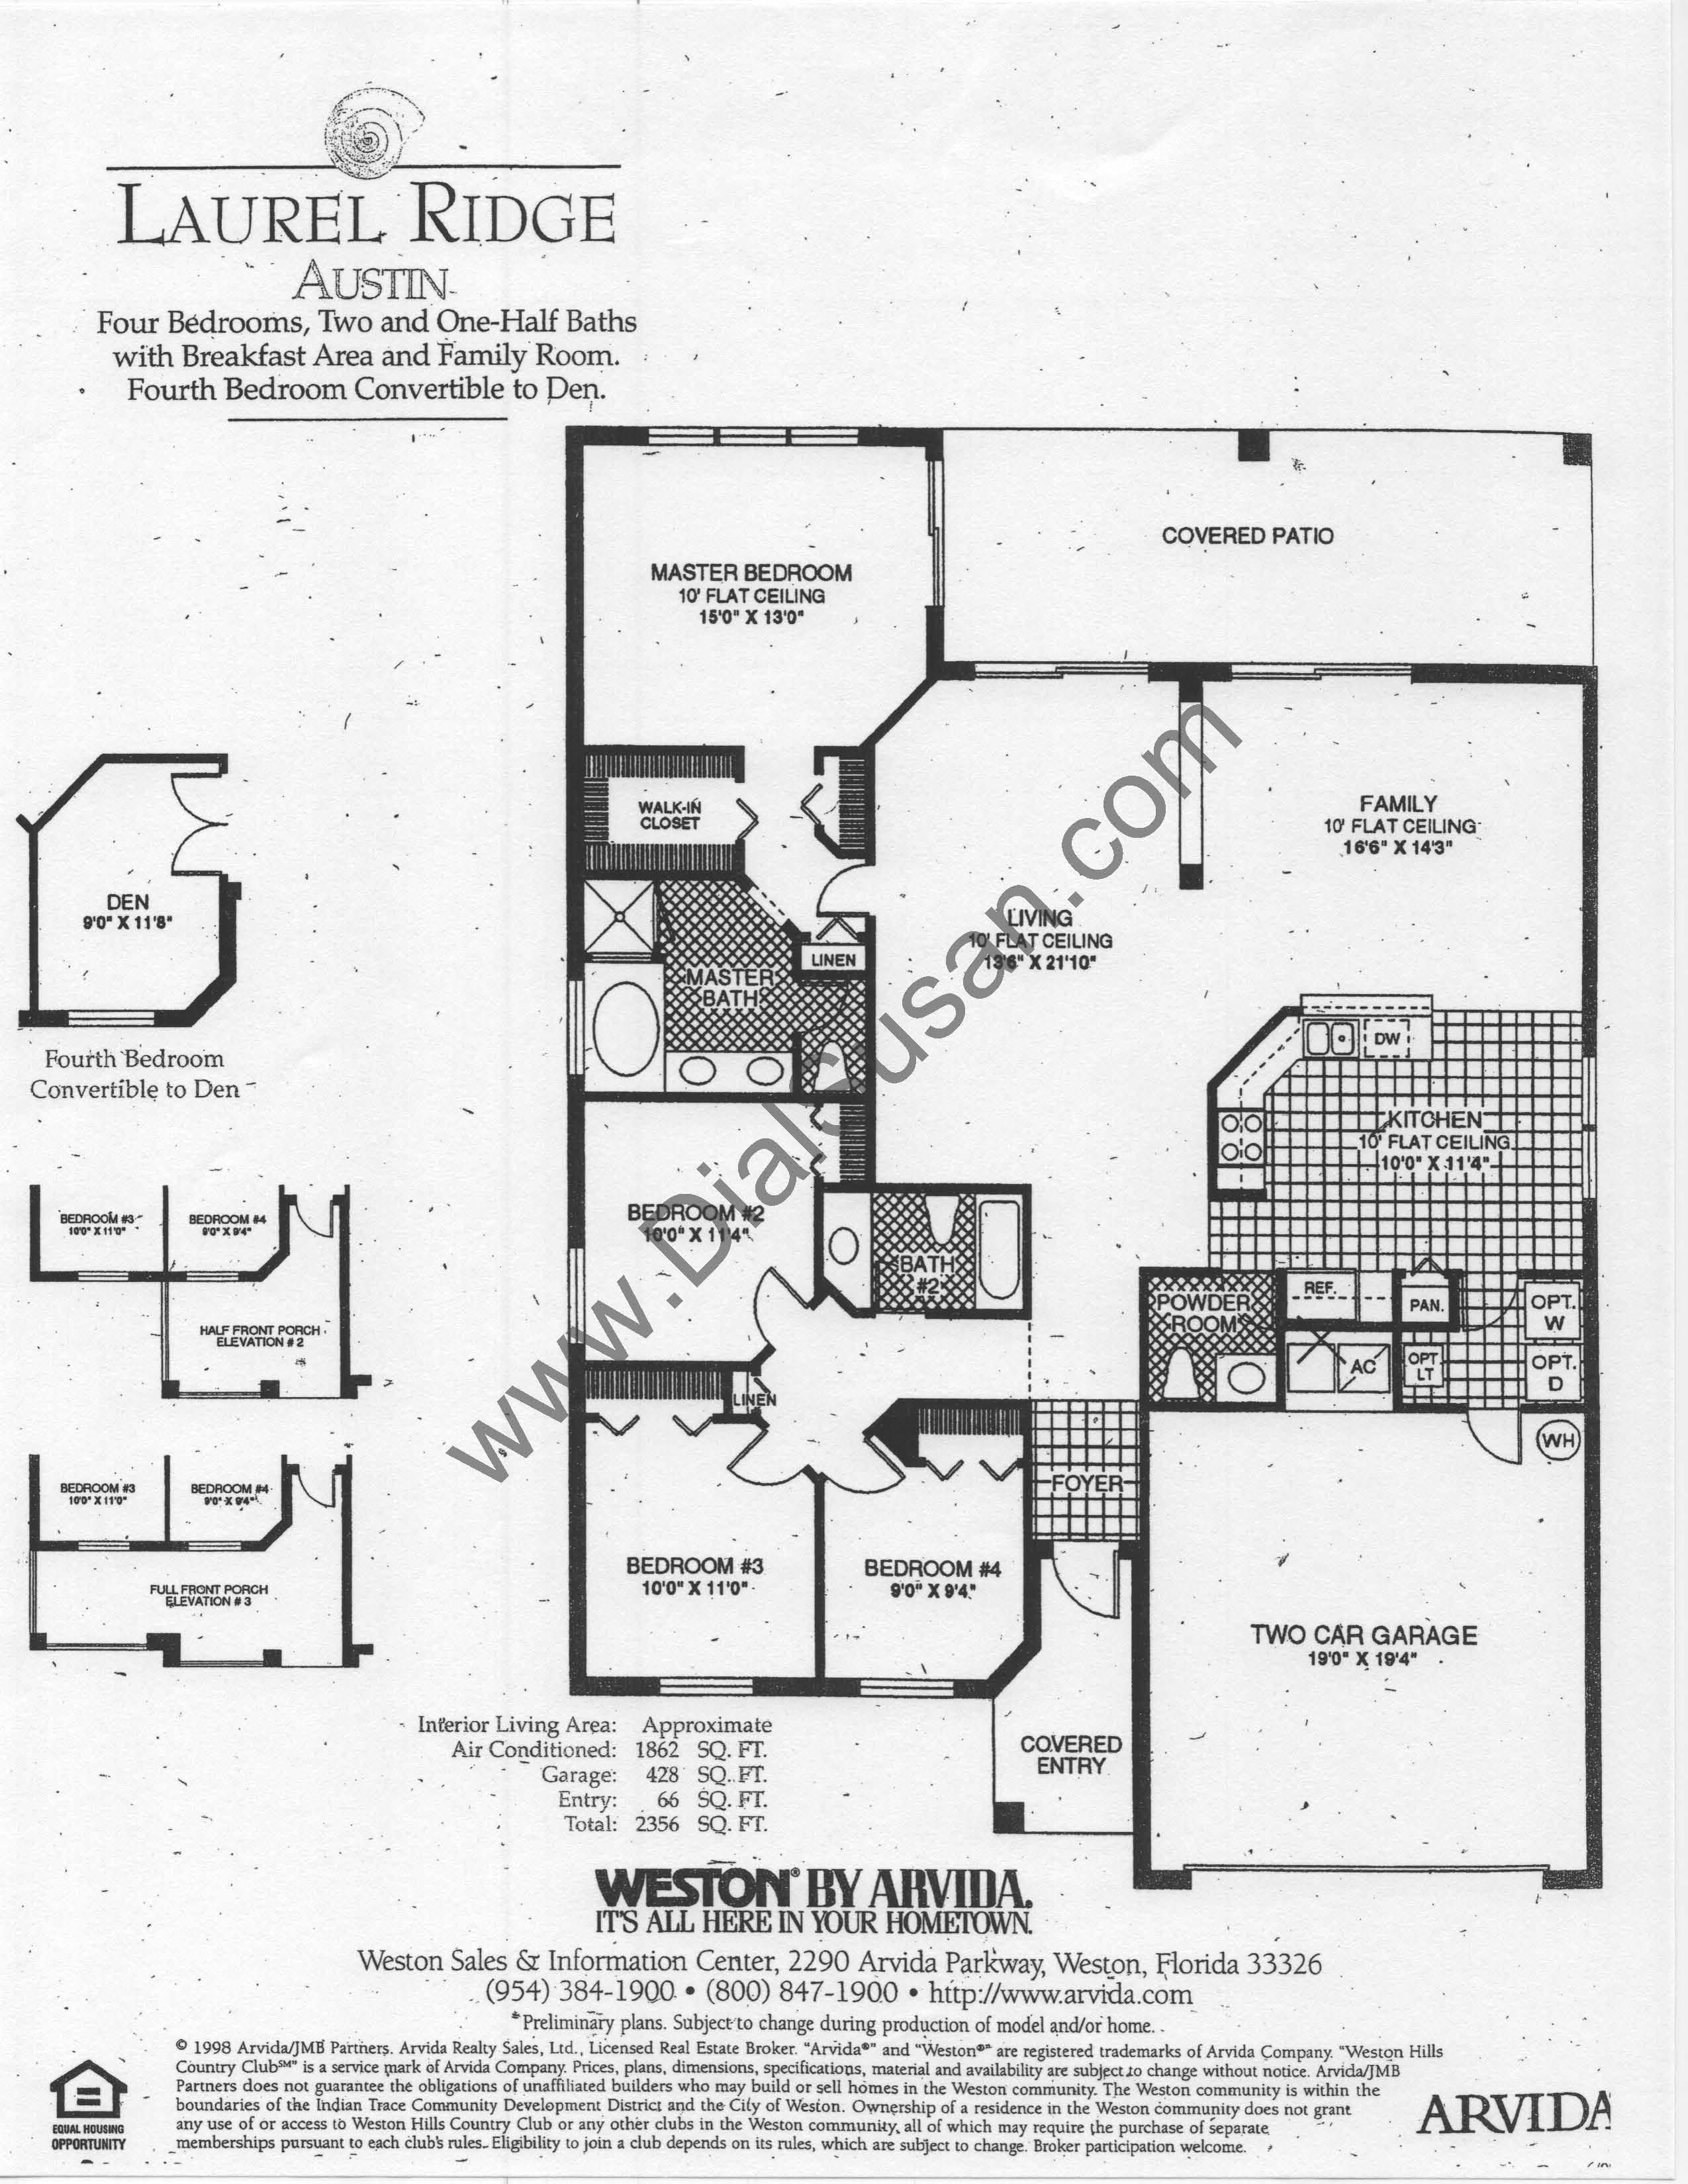 susan hesselman realtor in the ridges Arvida Homes Floor Plans Arvida Homes Floor Plans #1 arvida homes floor plans